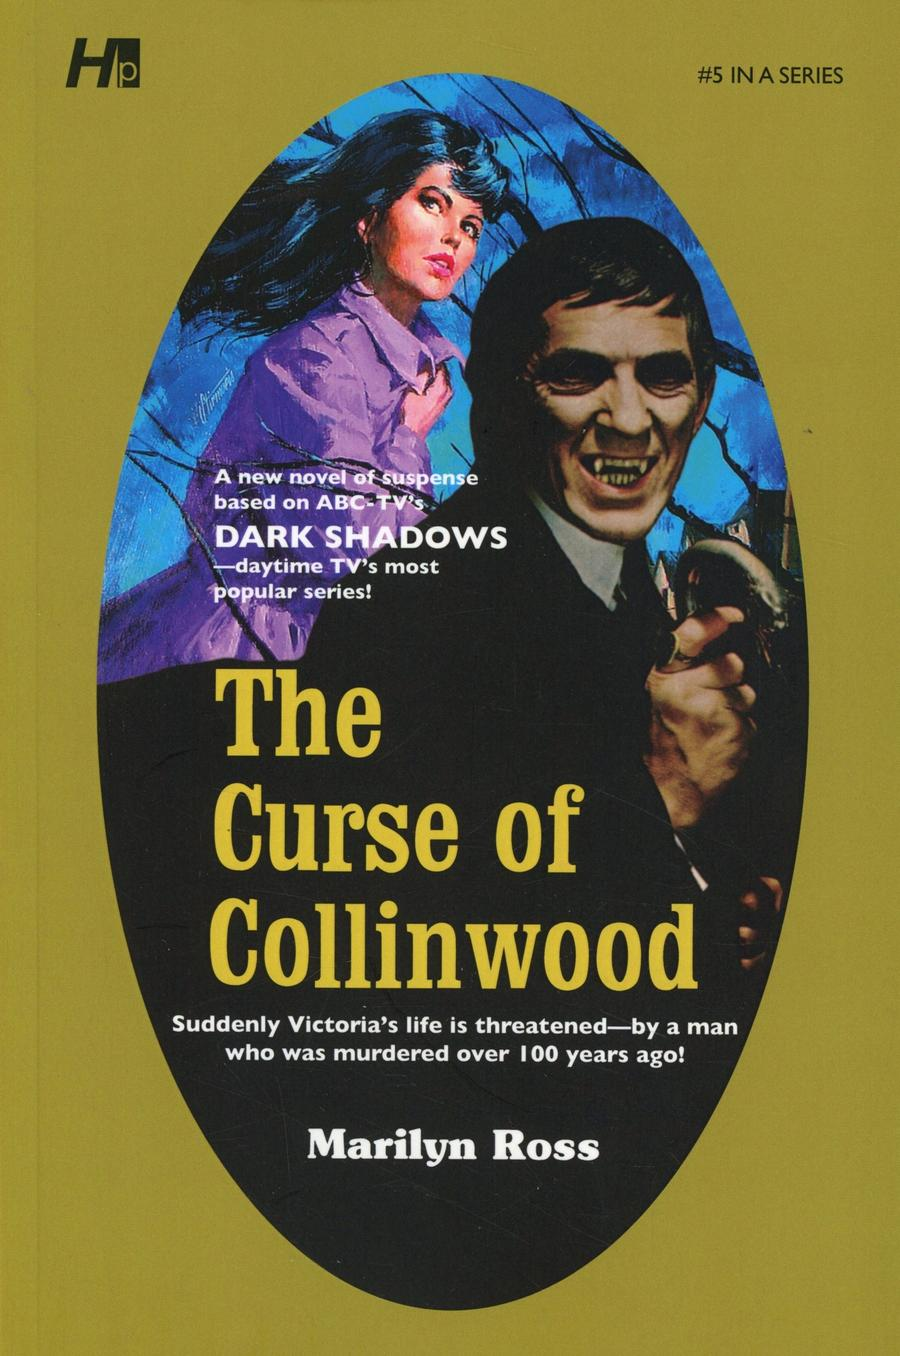 Dark Shadows Paperback Library Novel Vol 5 Curse Of Collinwood TP